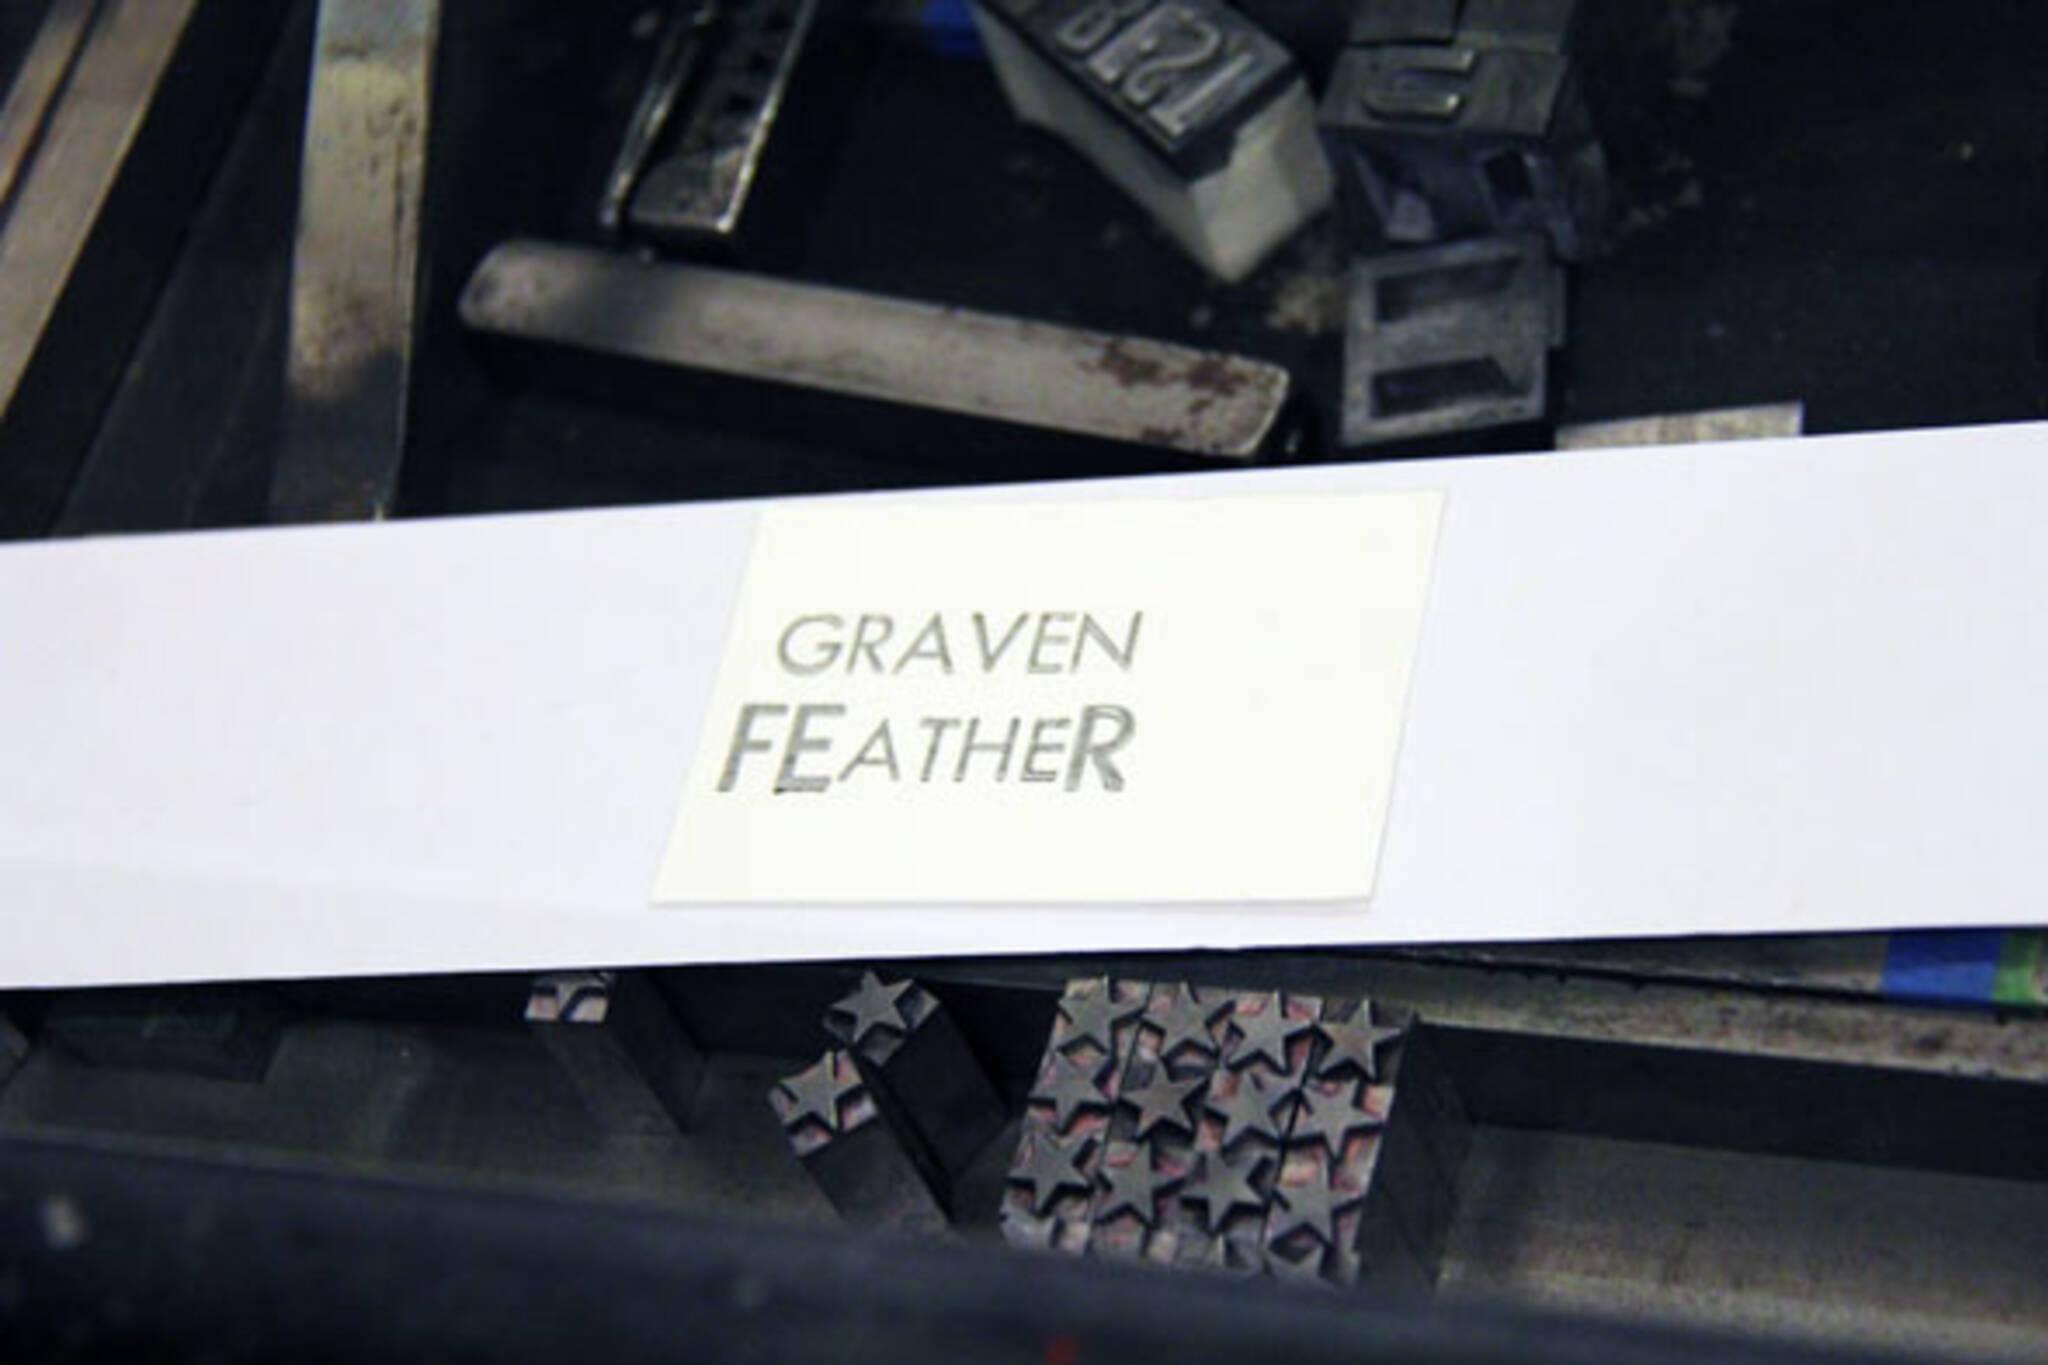 graven feather toronto workshop